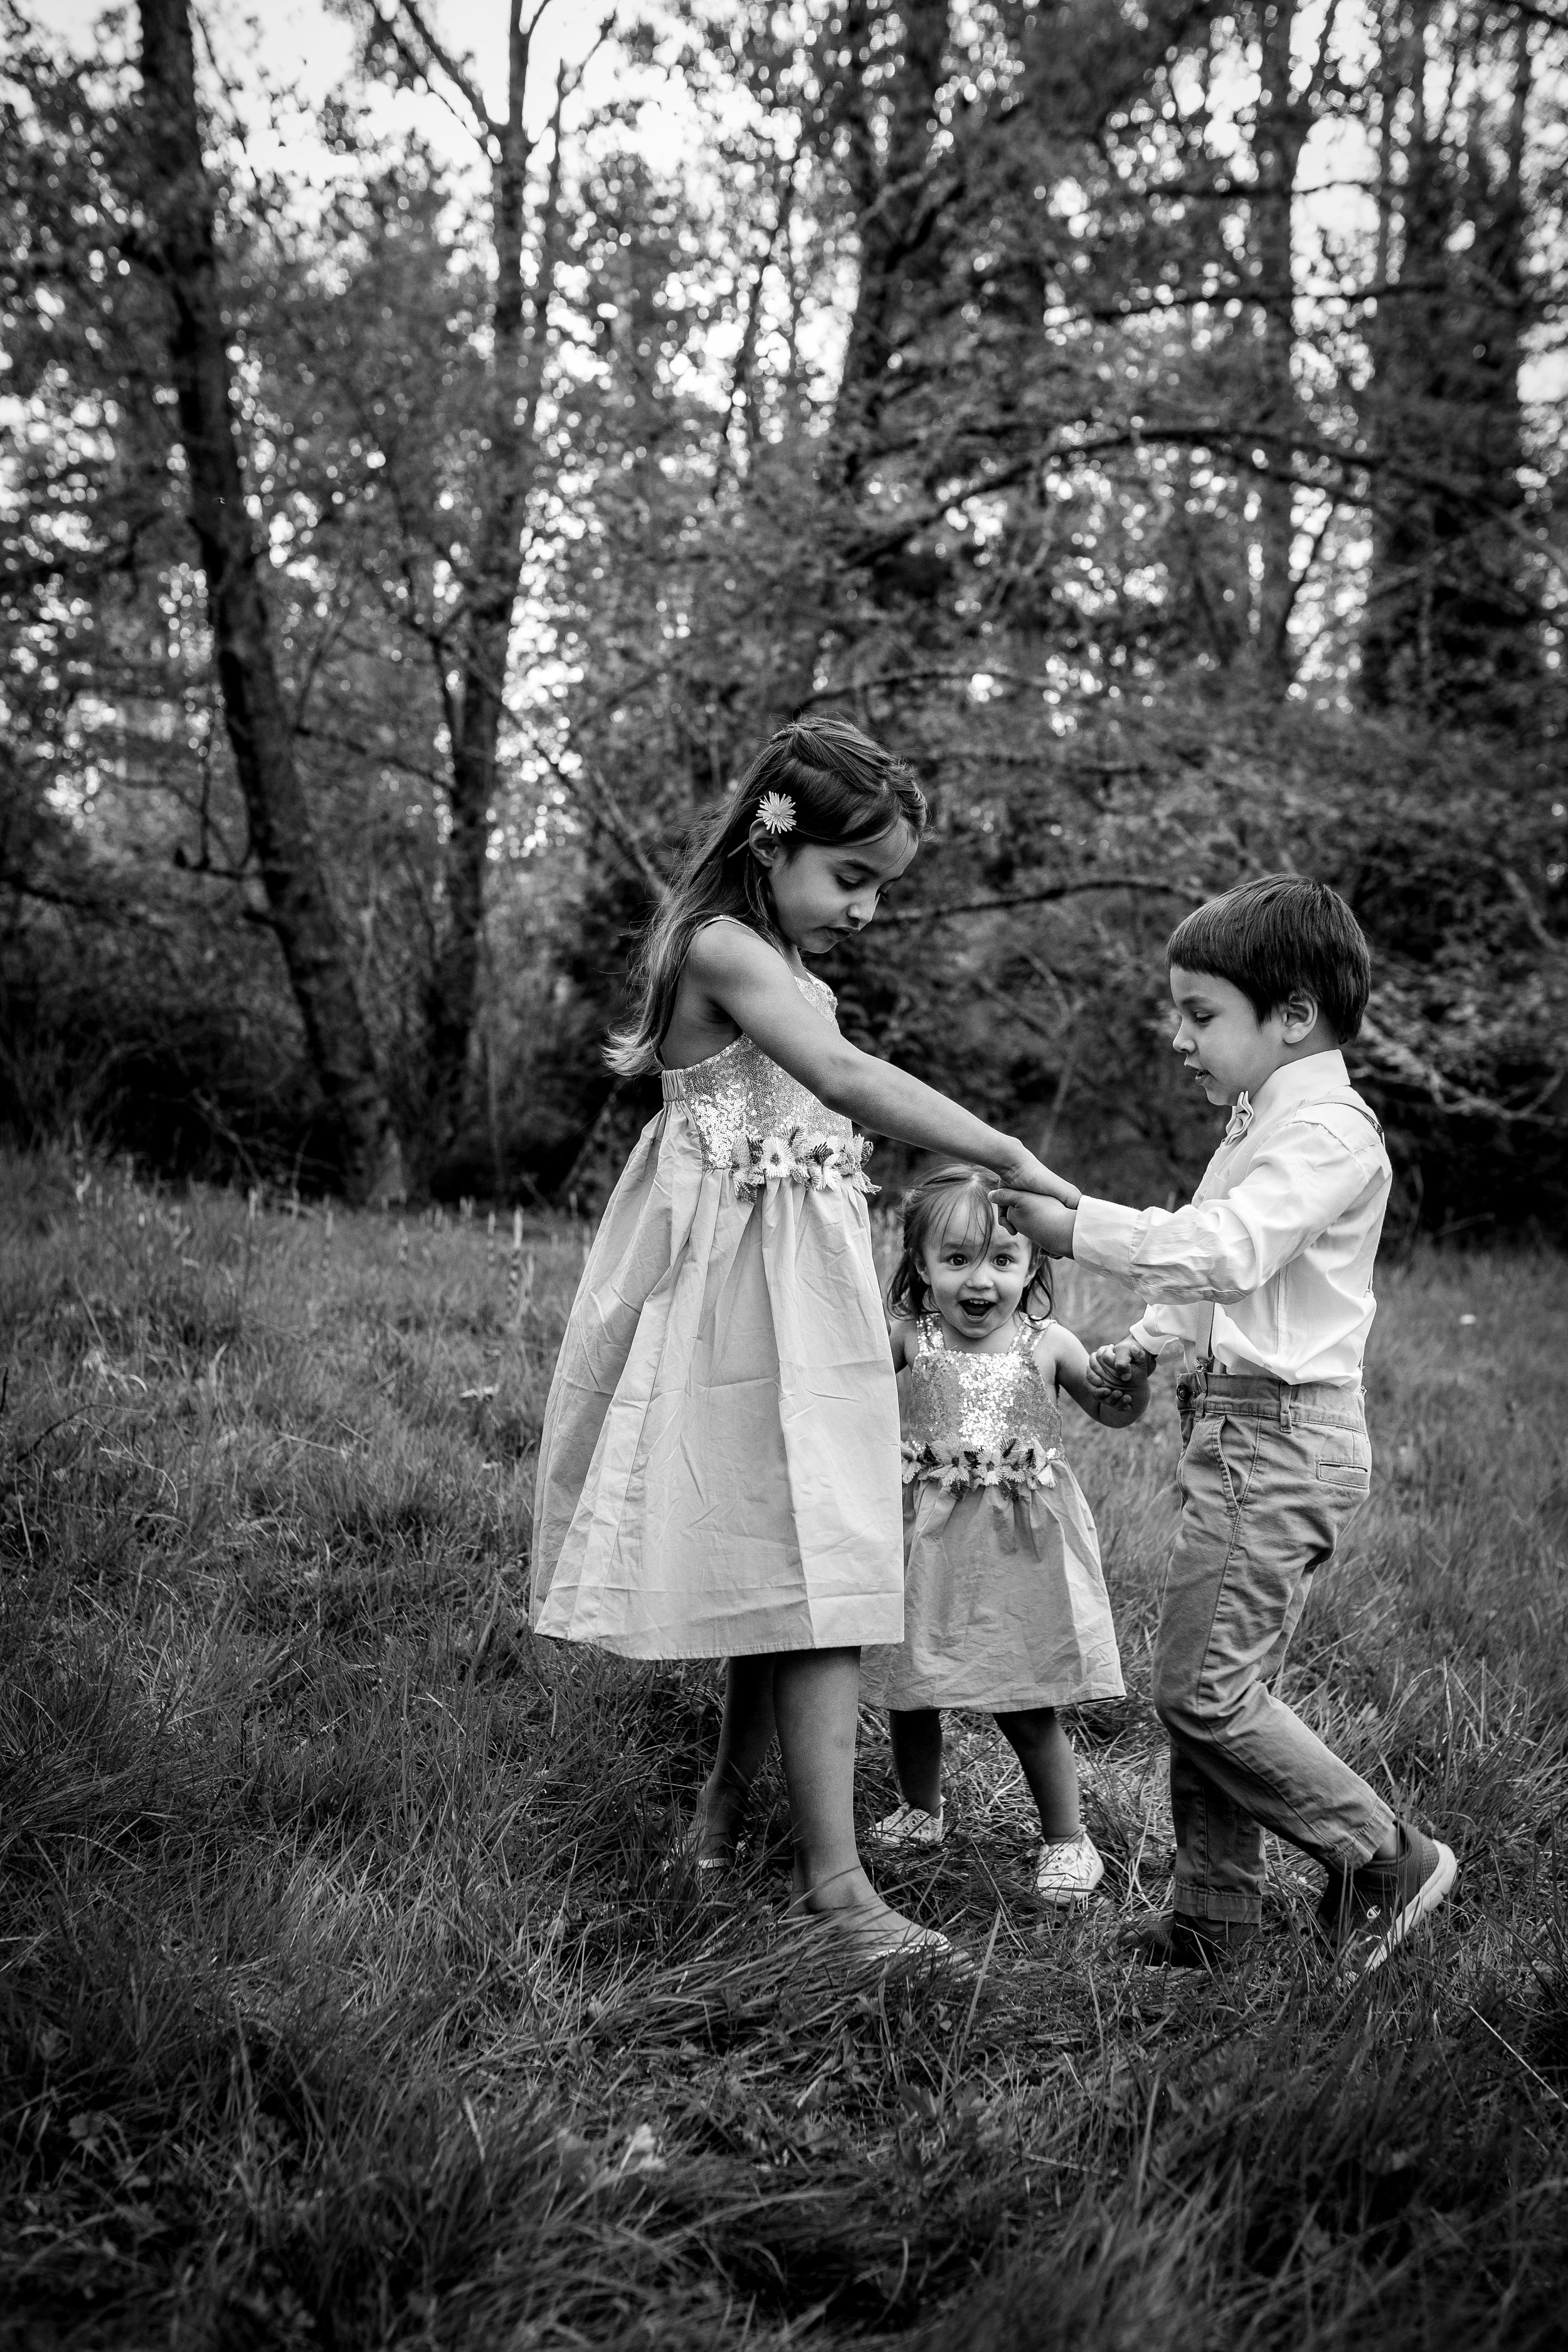 childrendancing.jpg